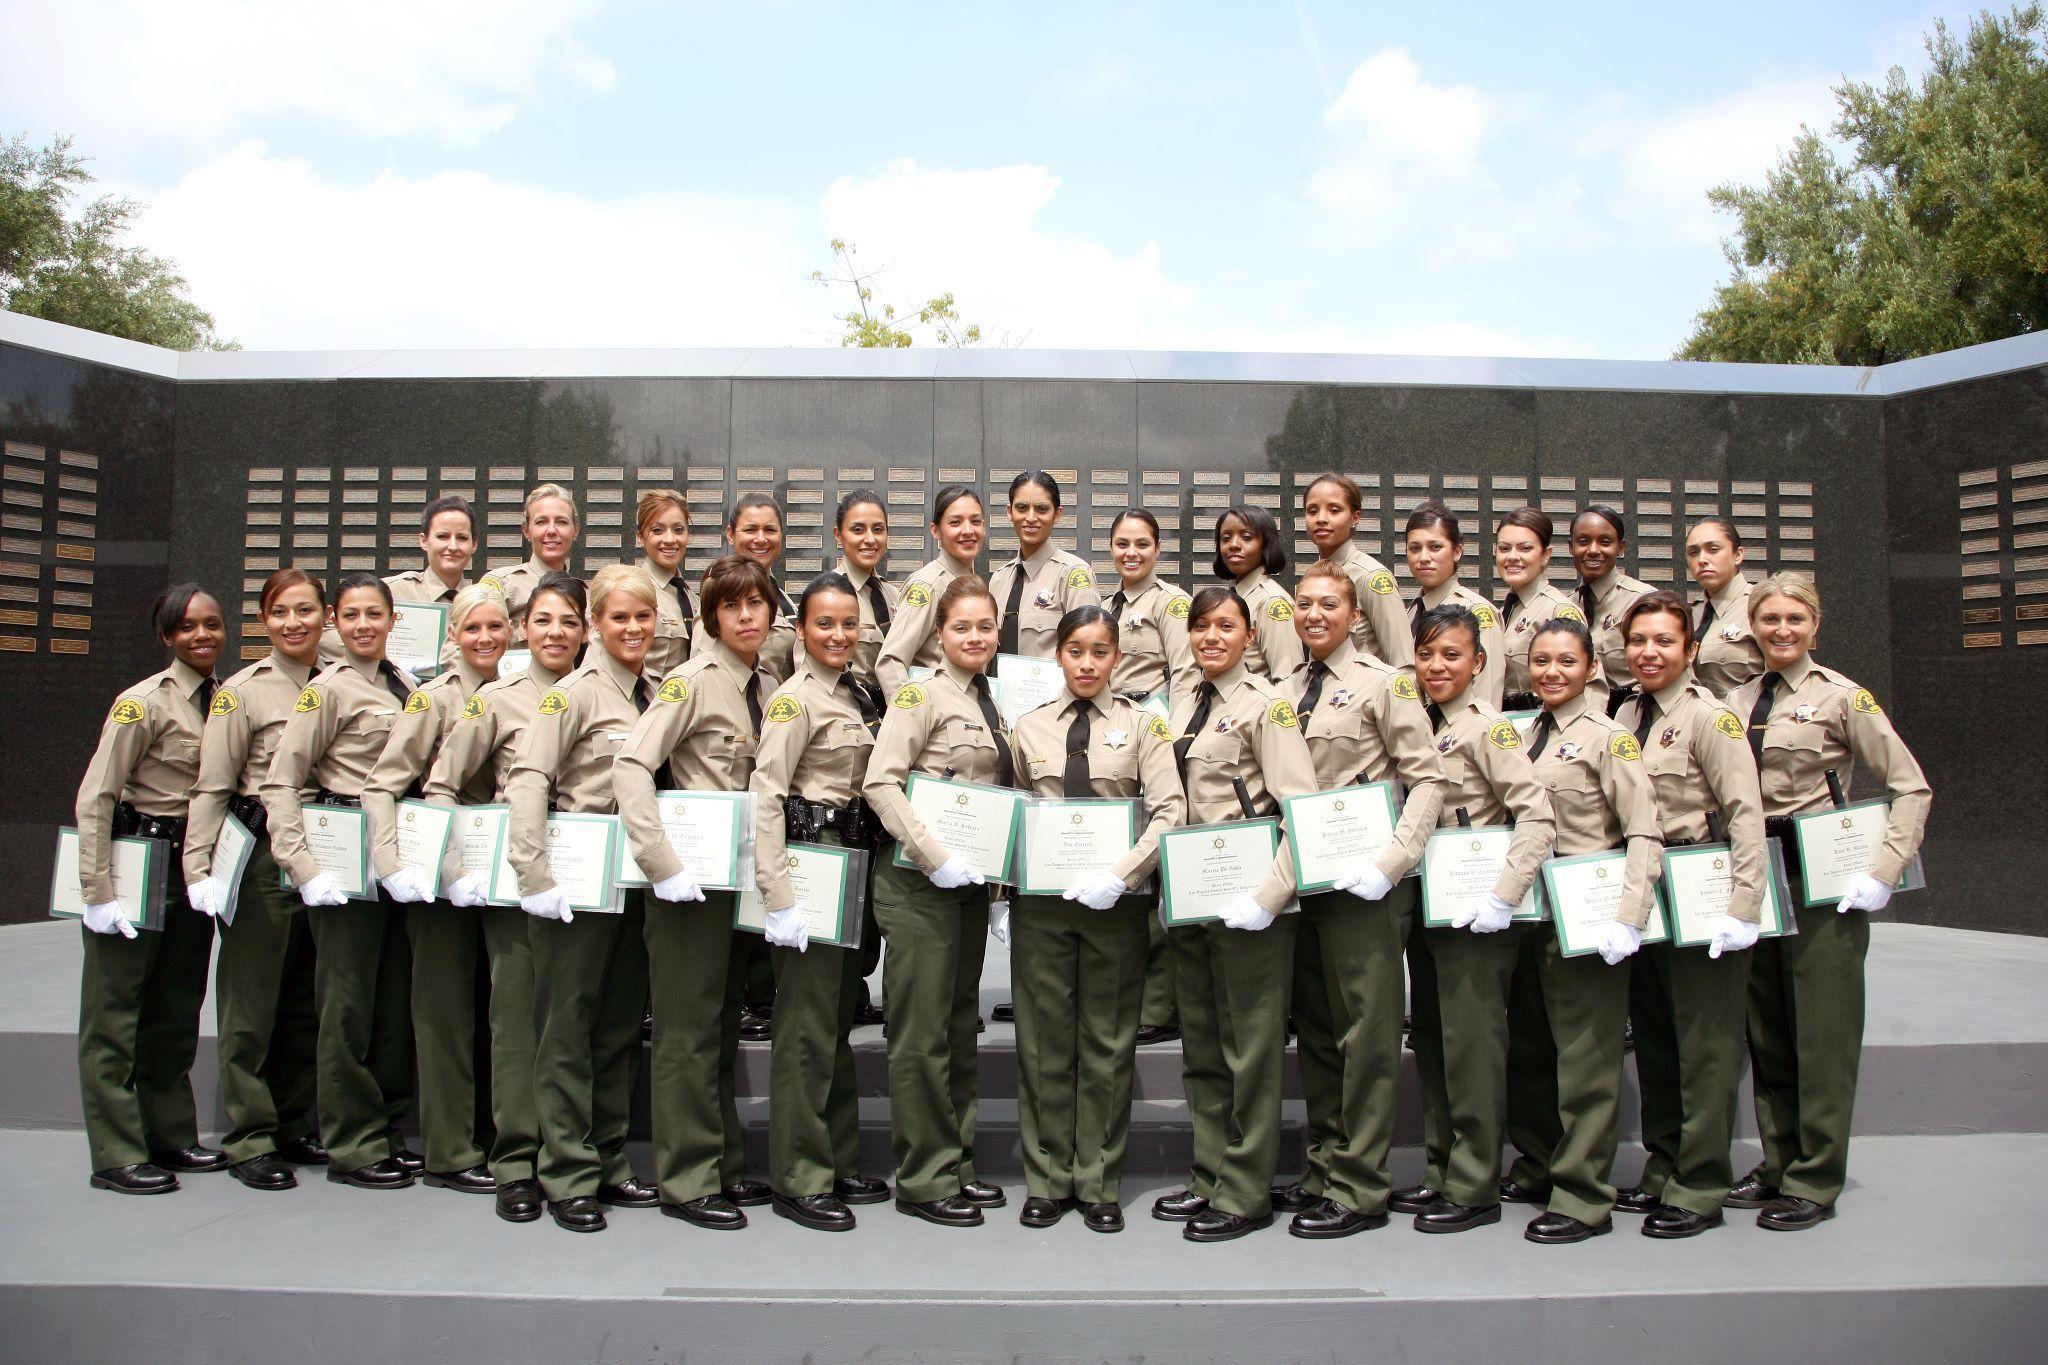 Photo 30 Female Deputies Graduate From Lasd Academy Class 376 In 2009 Photo Credit J Lopez Police Women Female Think Tank